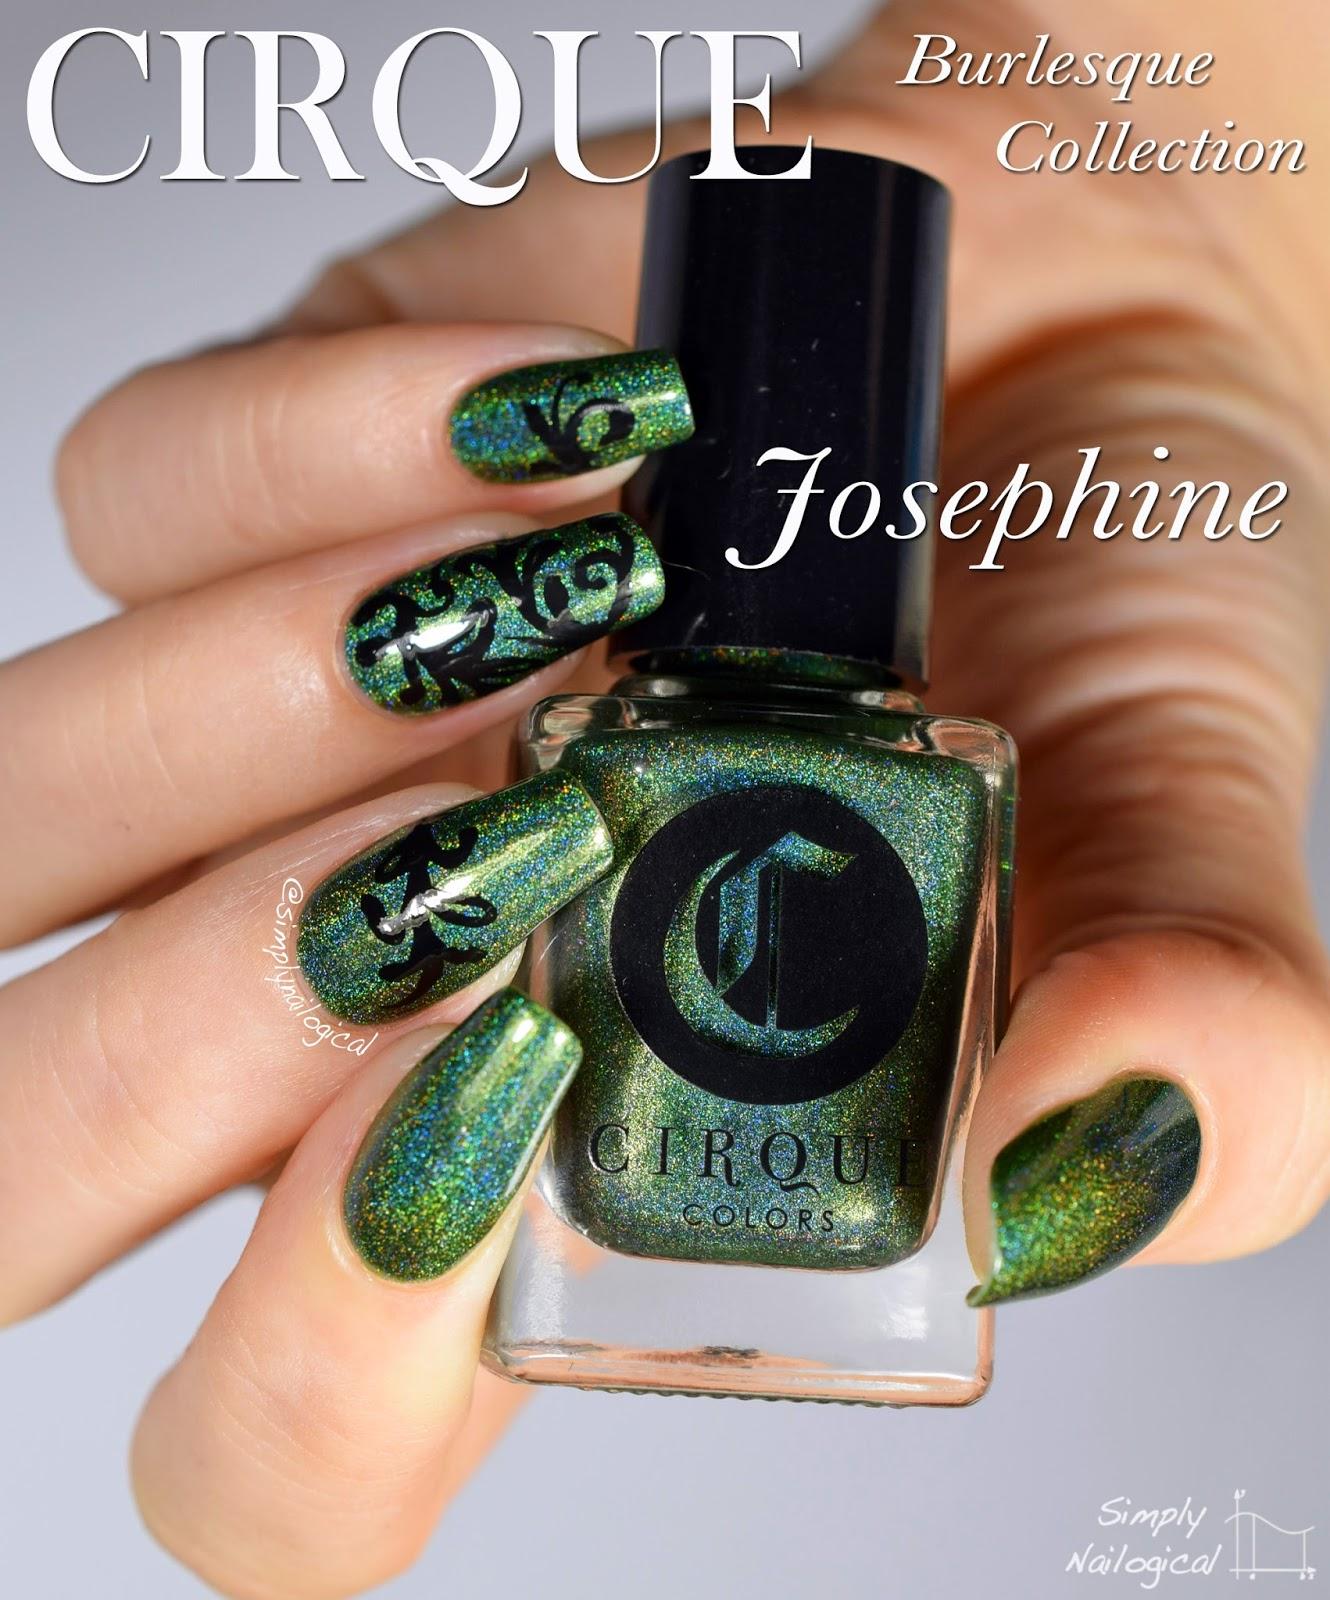 Cirque Burlesque - Josephine